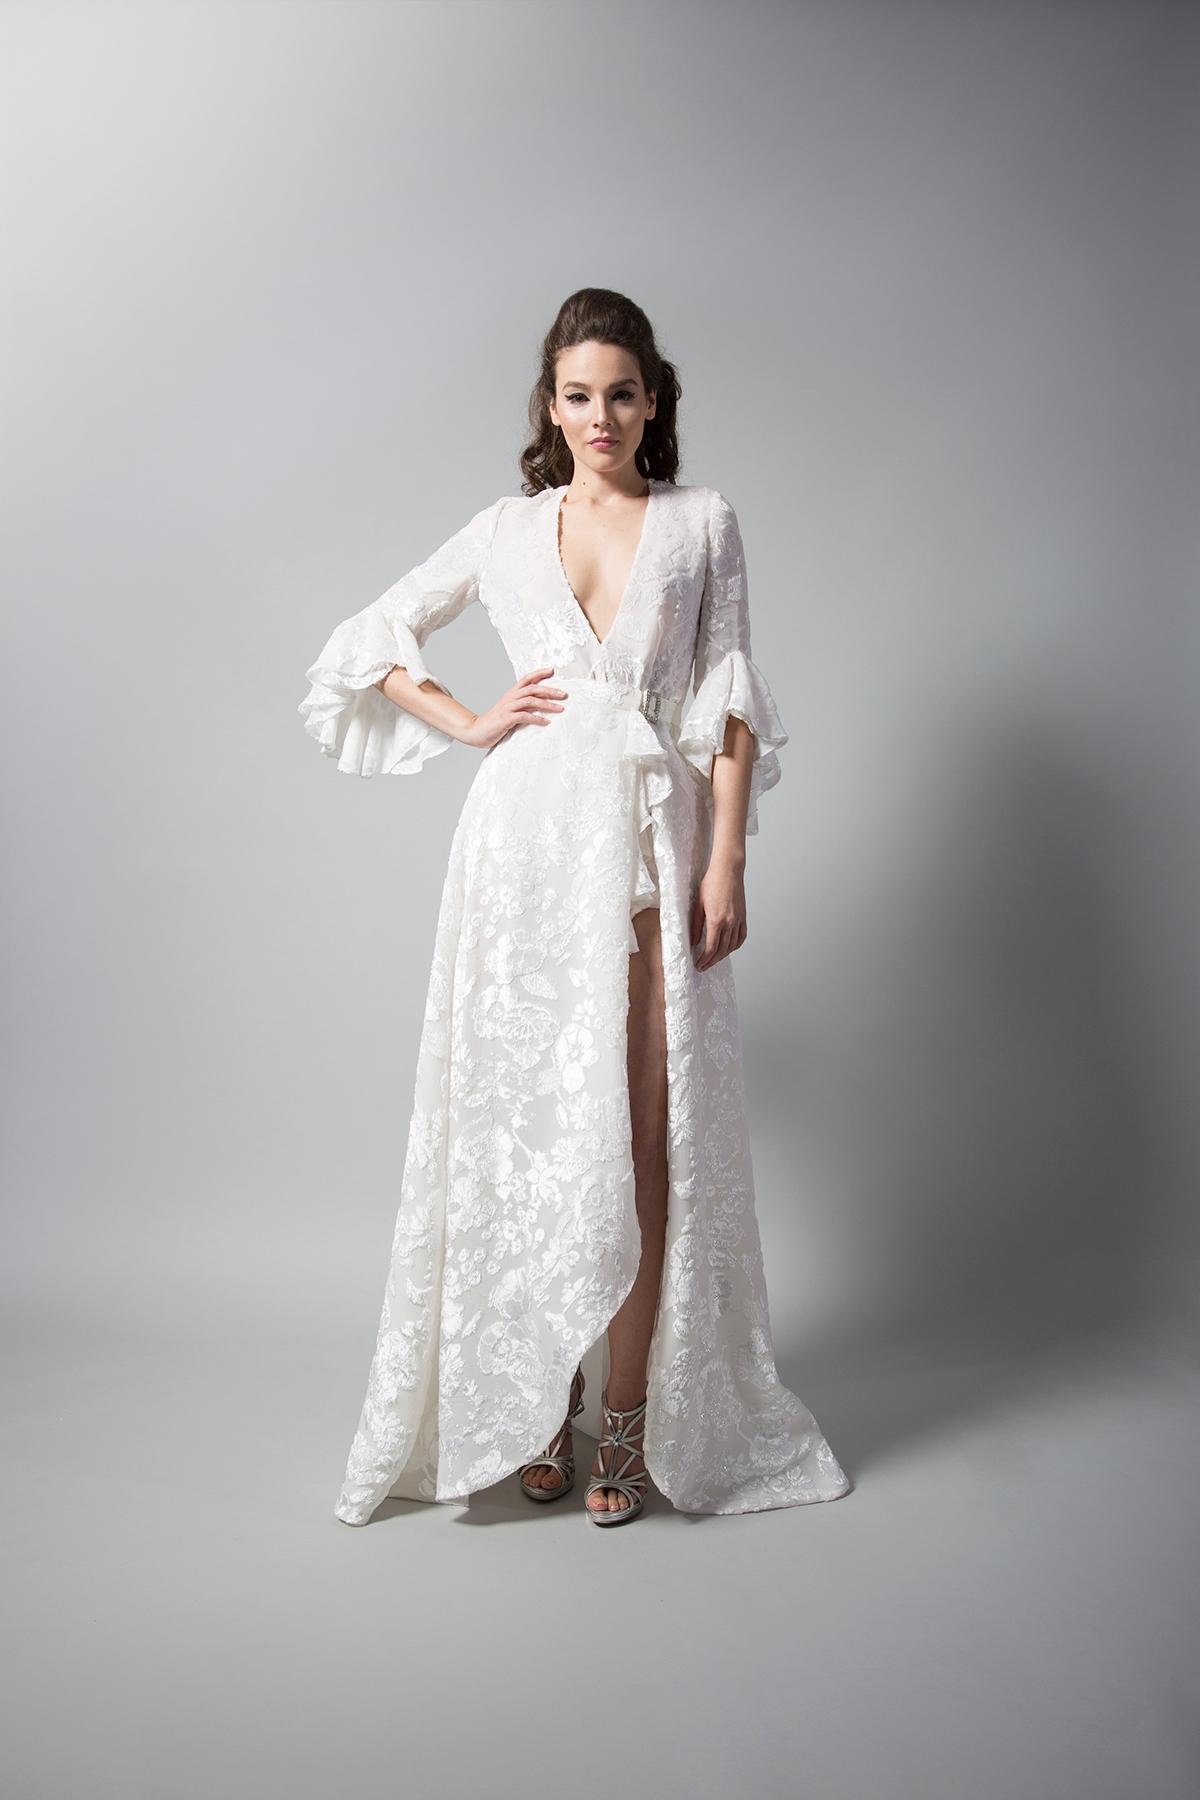 randi rahm three-quarter length bell sleeves wedding dress with high slit fall 2018